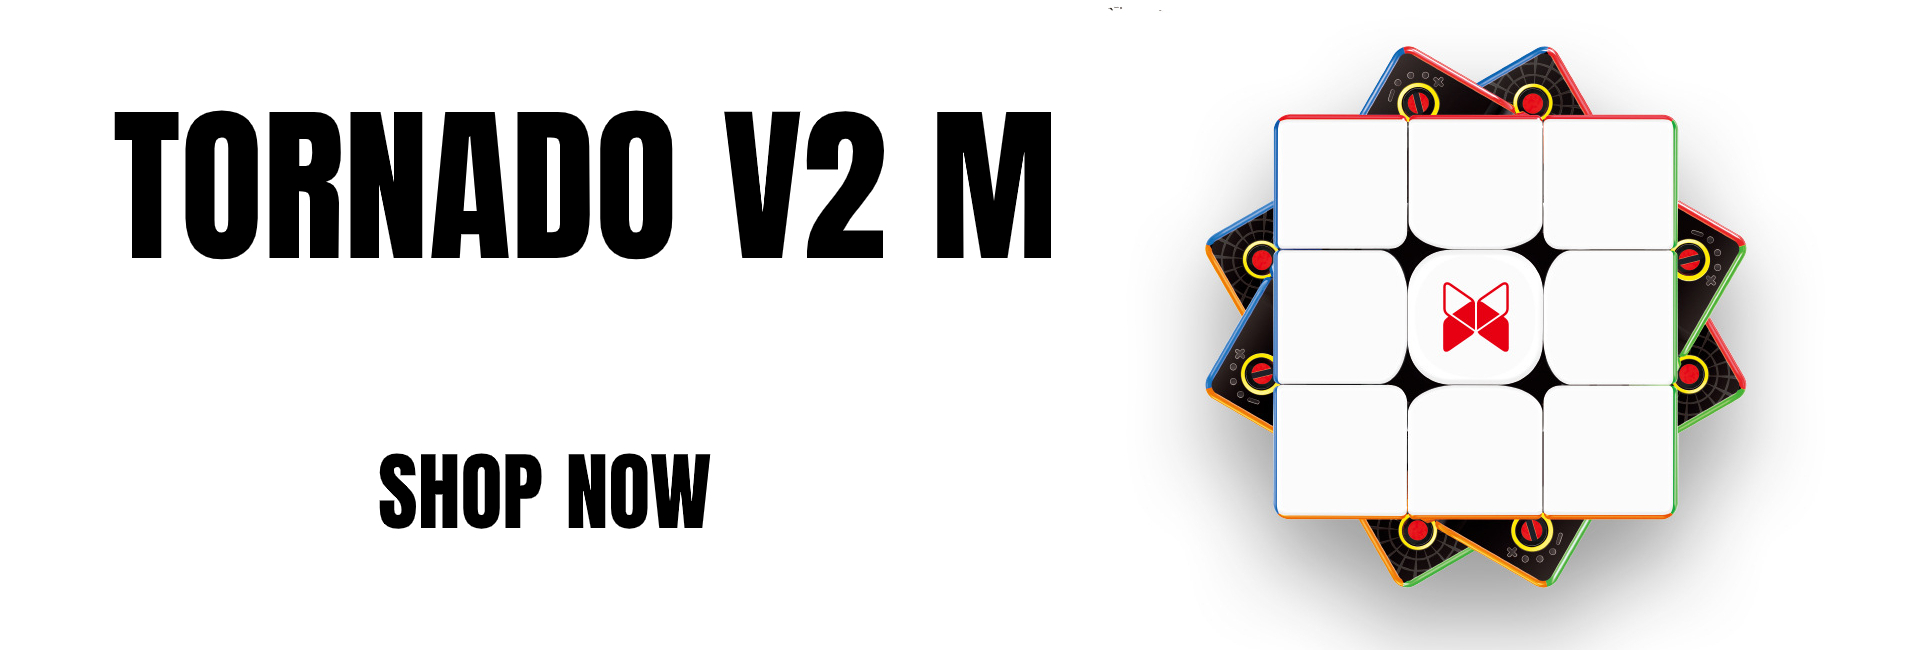 X-MAN-TORNADO-V2 M-BA